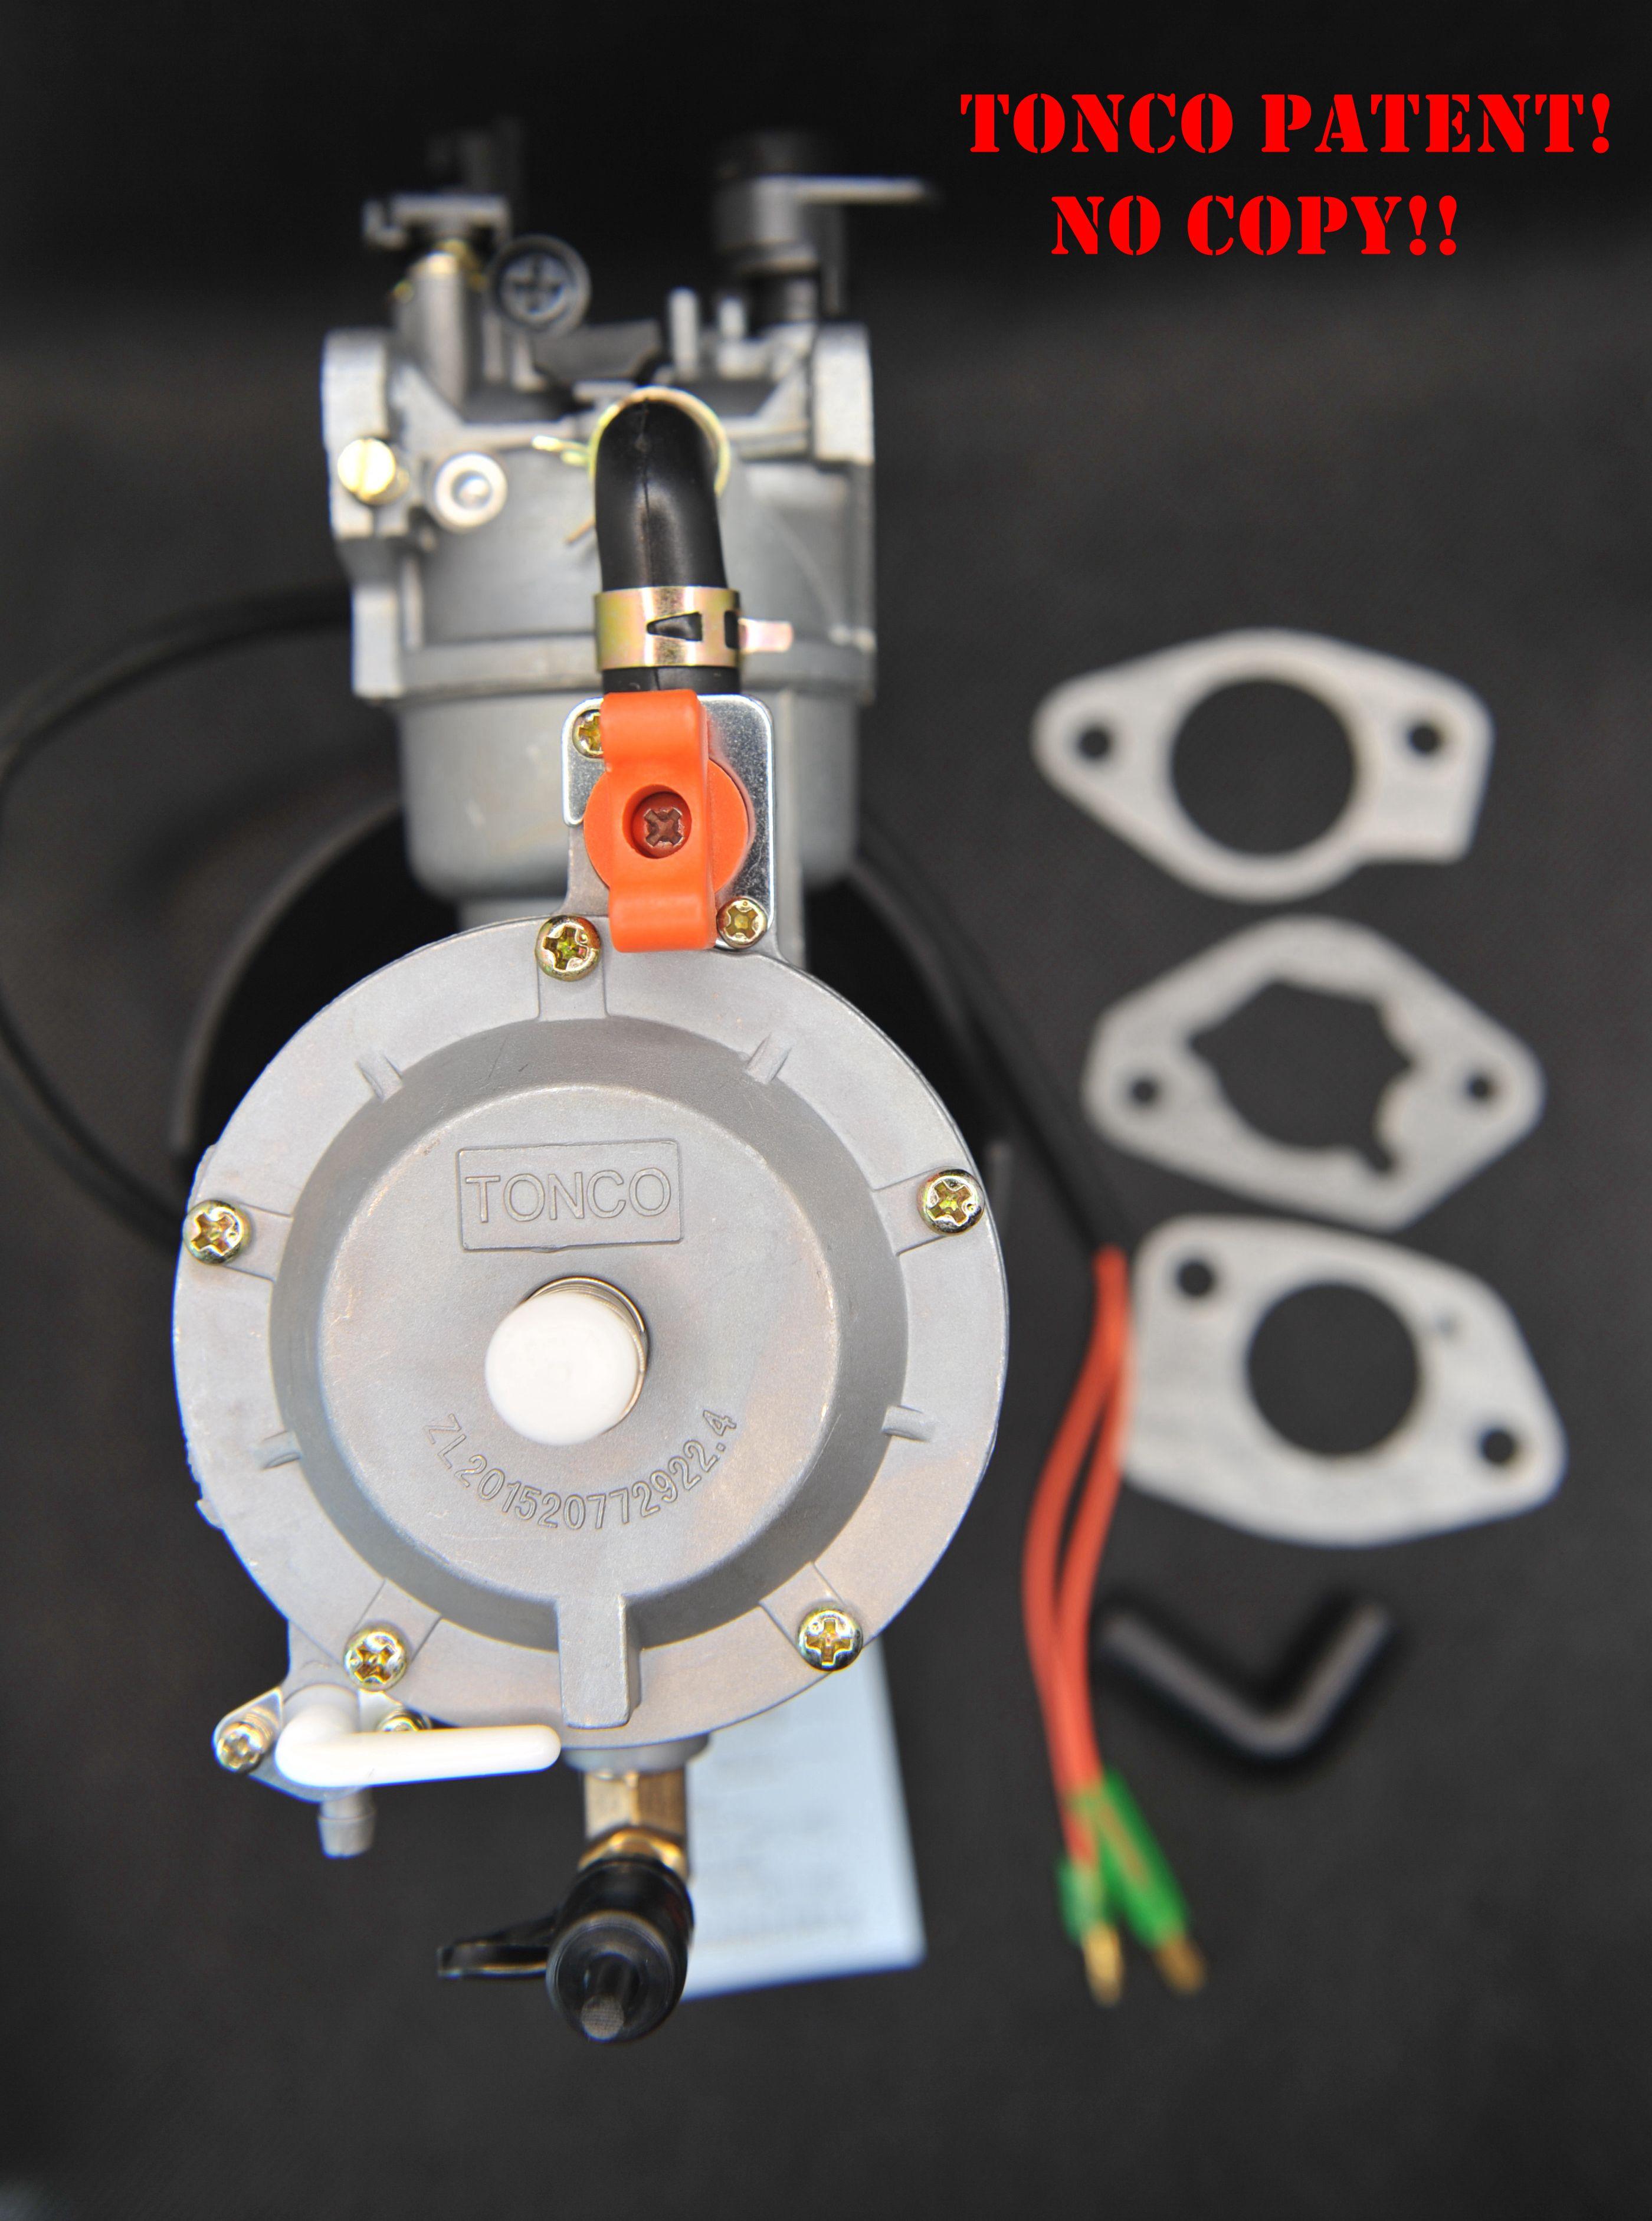 LPG NG Propane تحويل مجموعة لمولد البنزين الهجين 5KW 5000W 188F المكربن الوقود المزدوج مع الاختناق السيارات